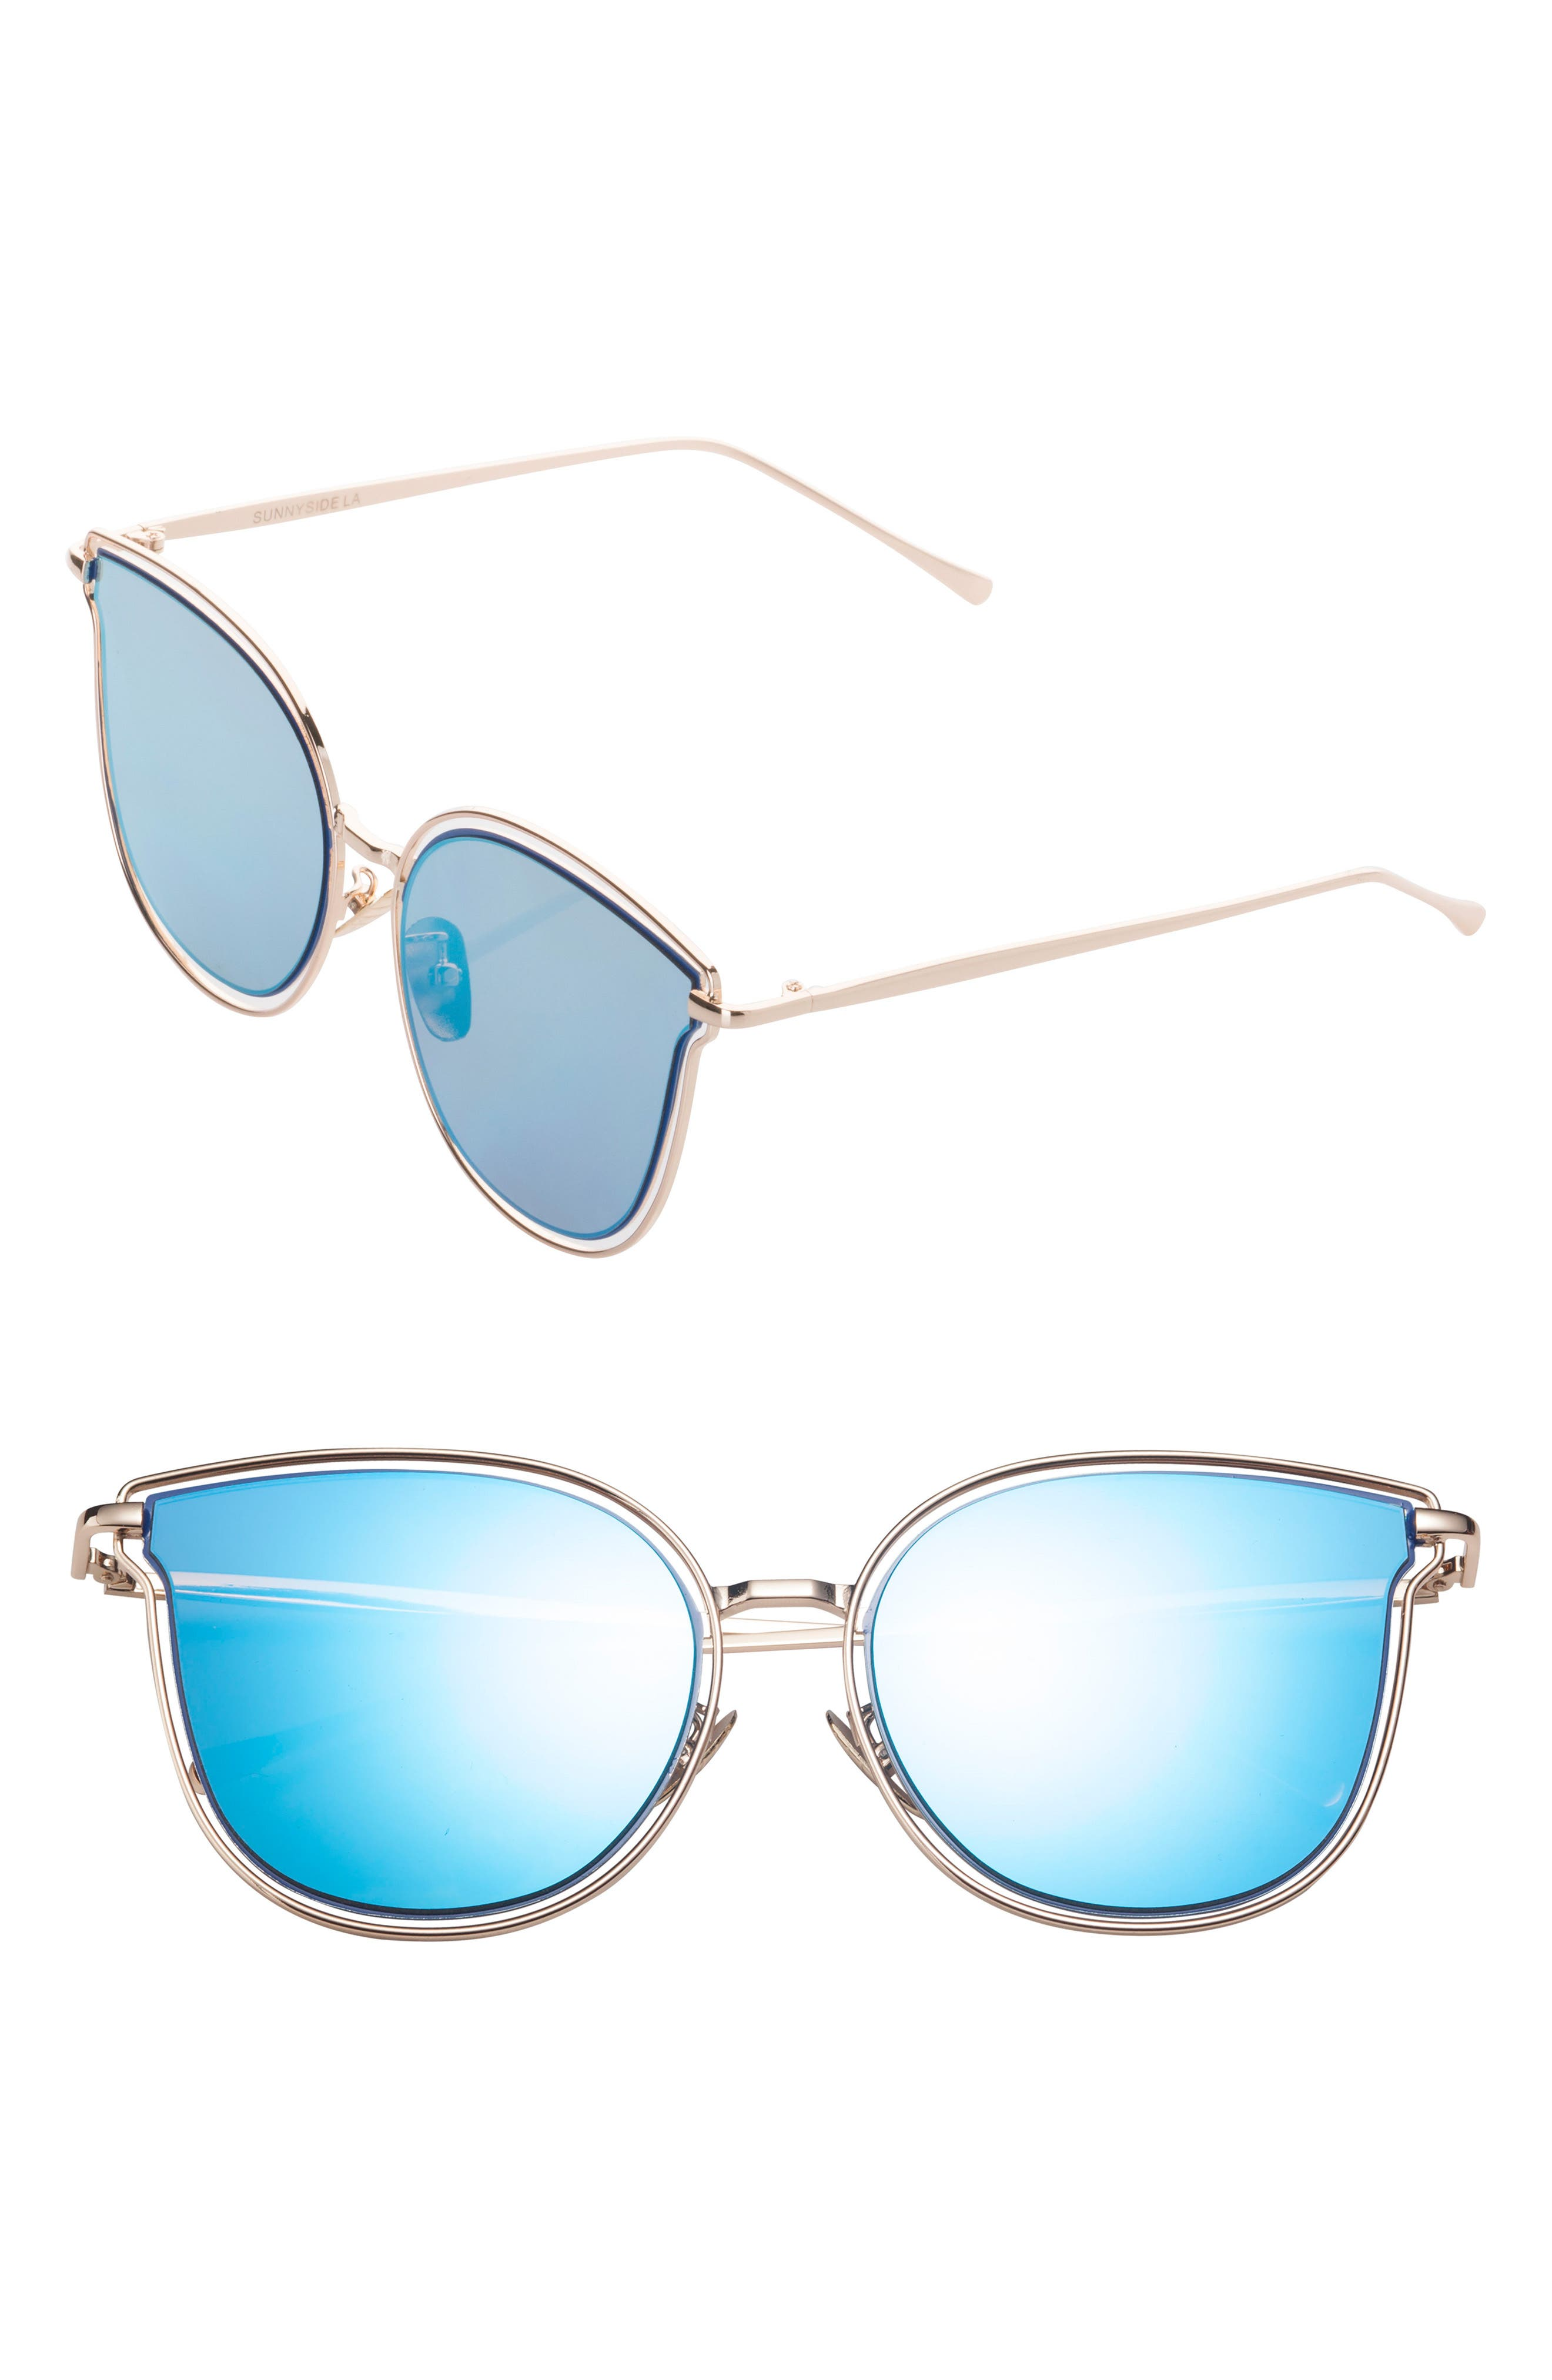 54mm Sunglasses,                         Main,                         color, 401